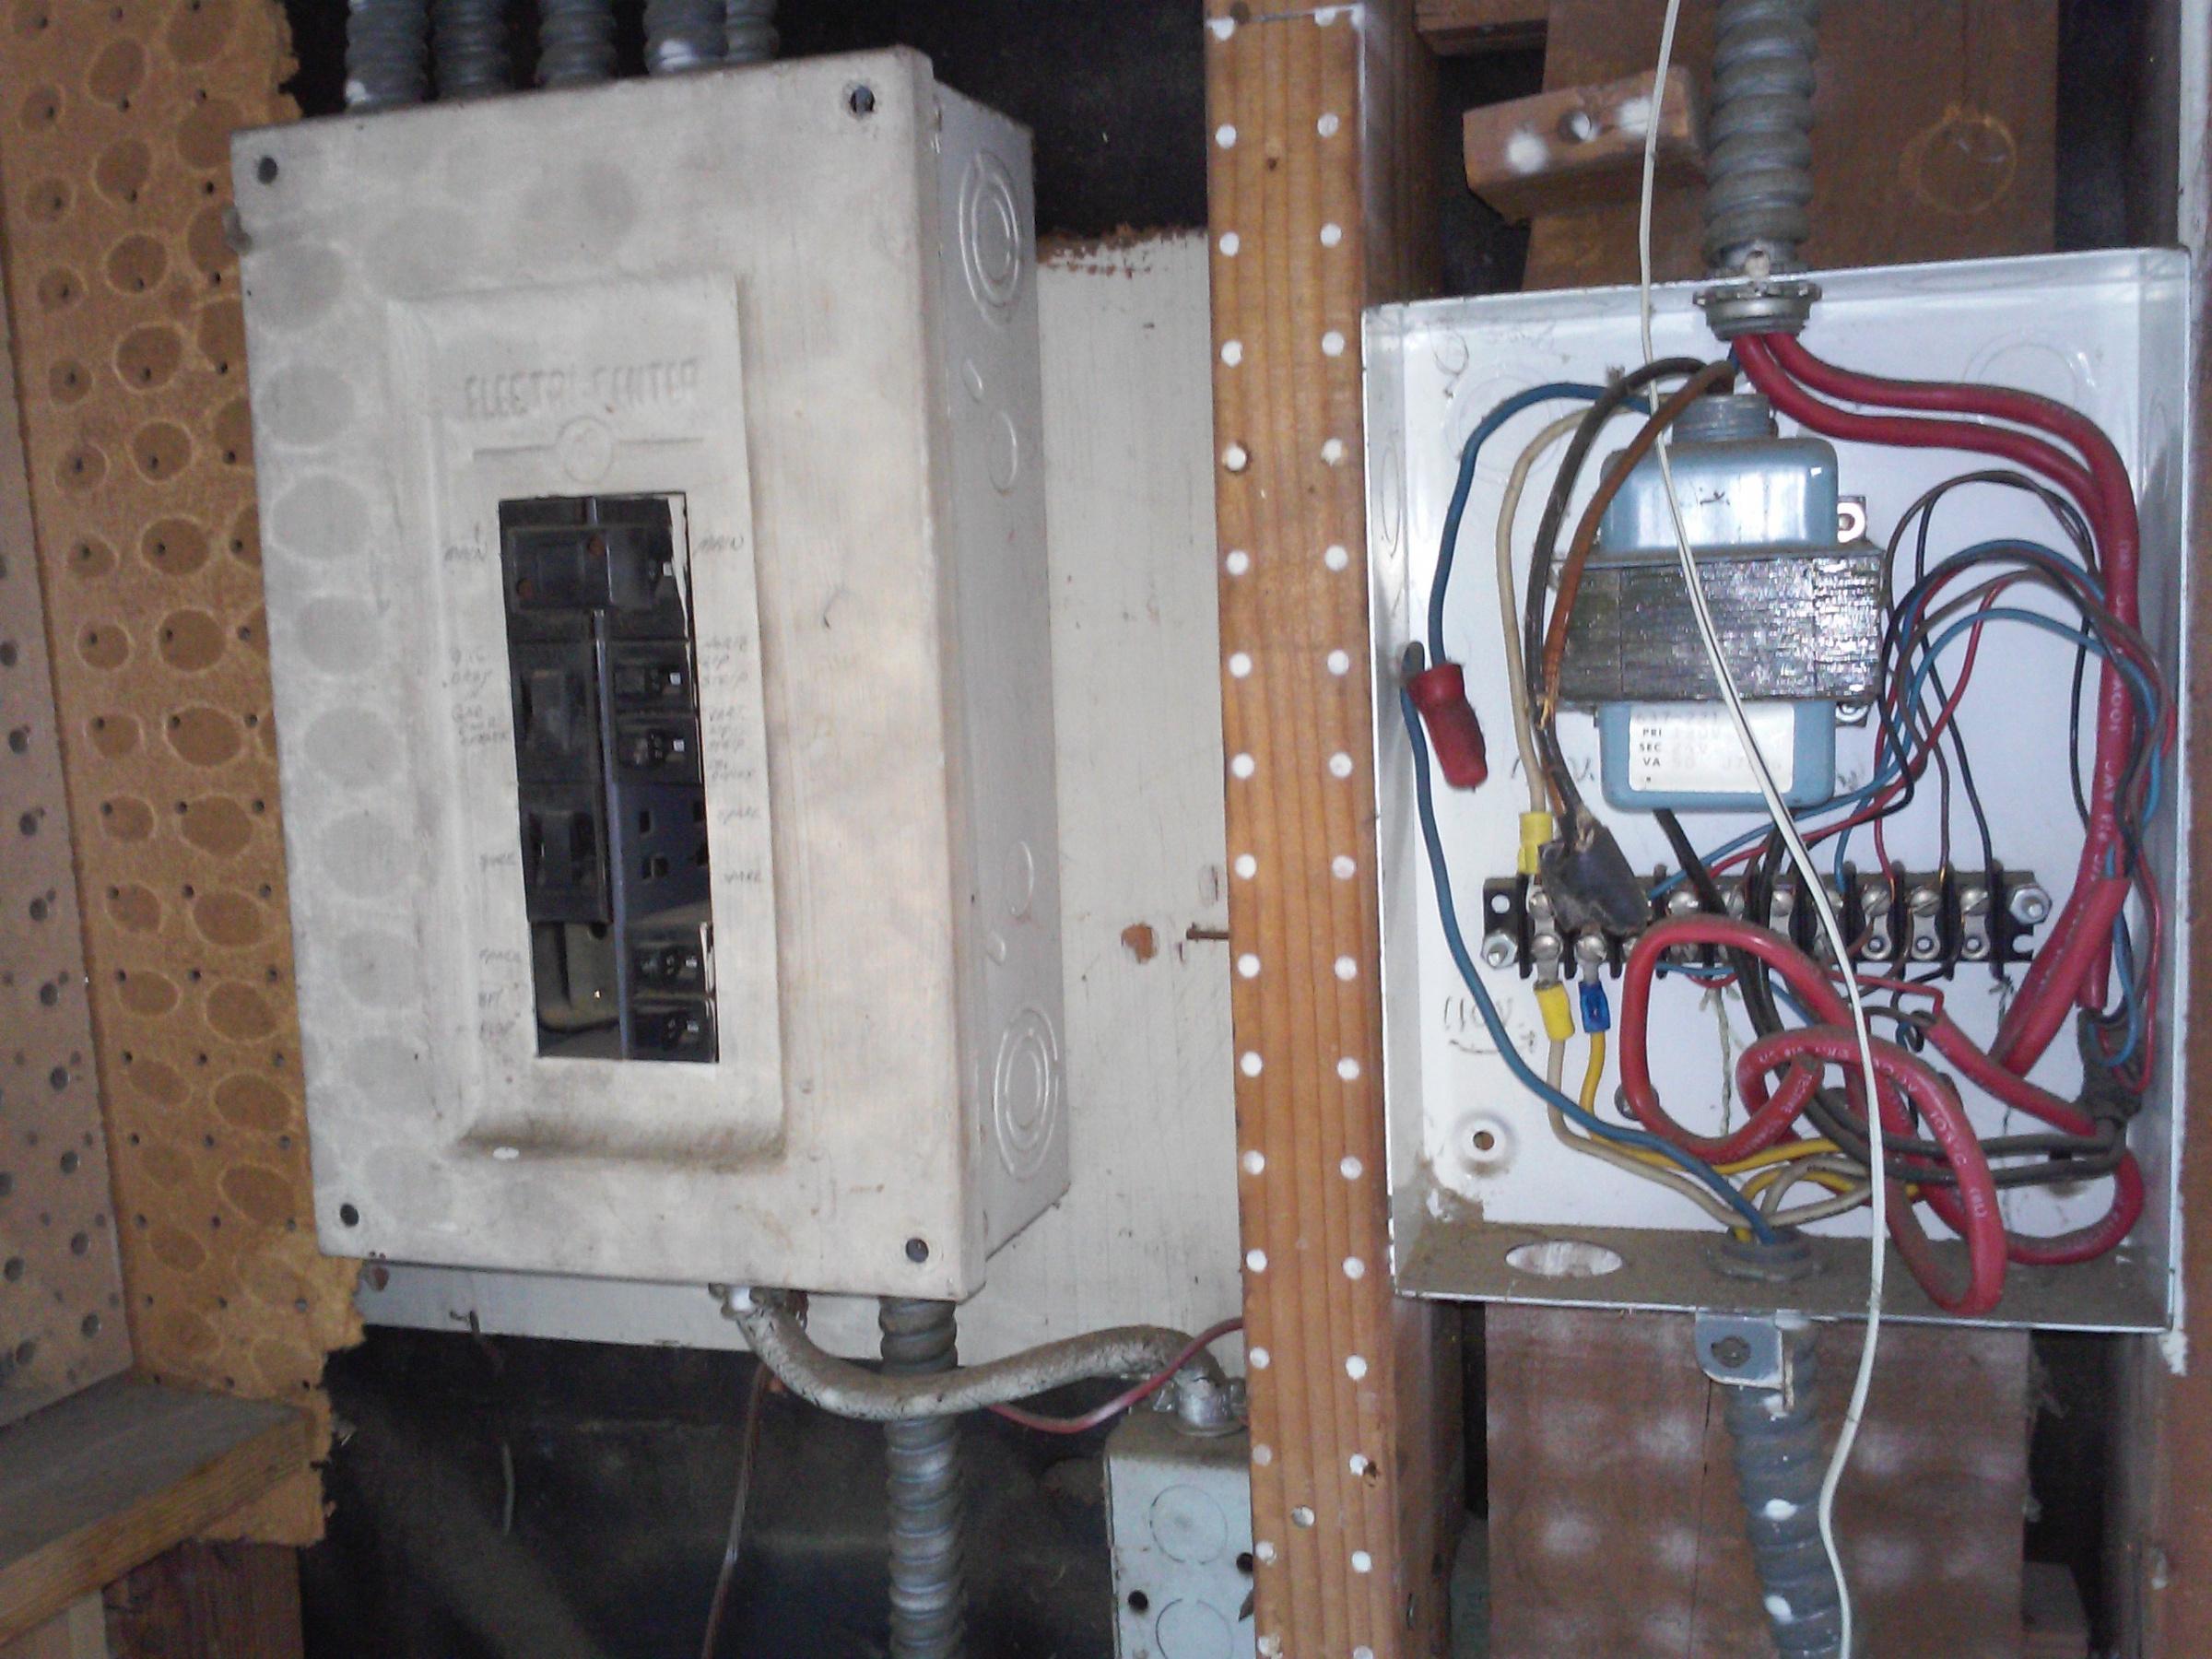 funky wiring in garage. Is this a hazard?-img_20190726_175547.jpg